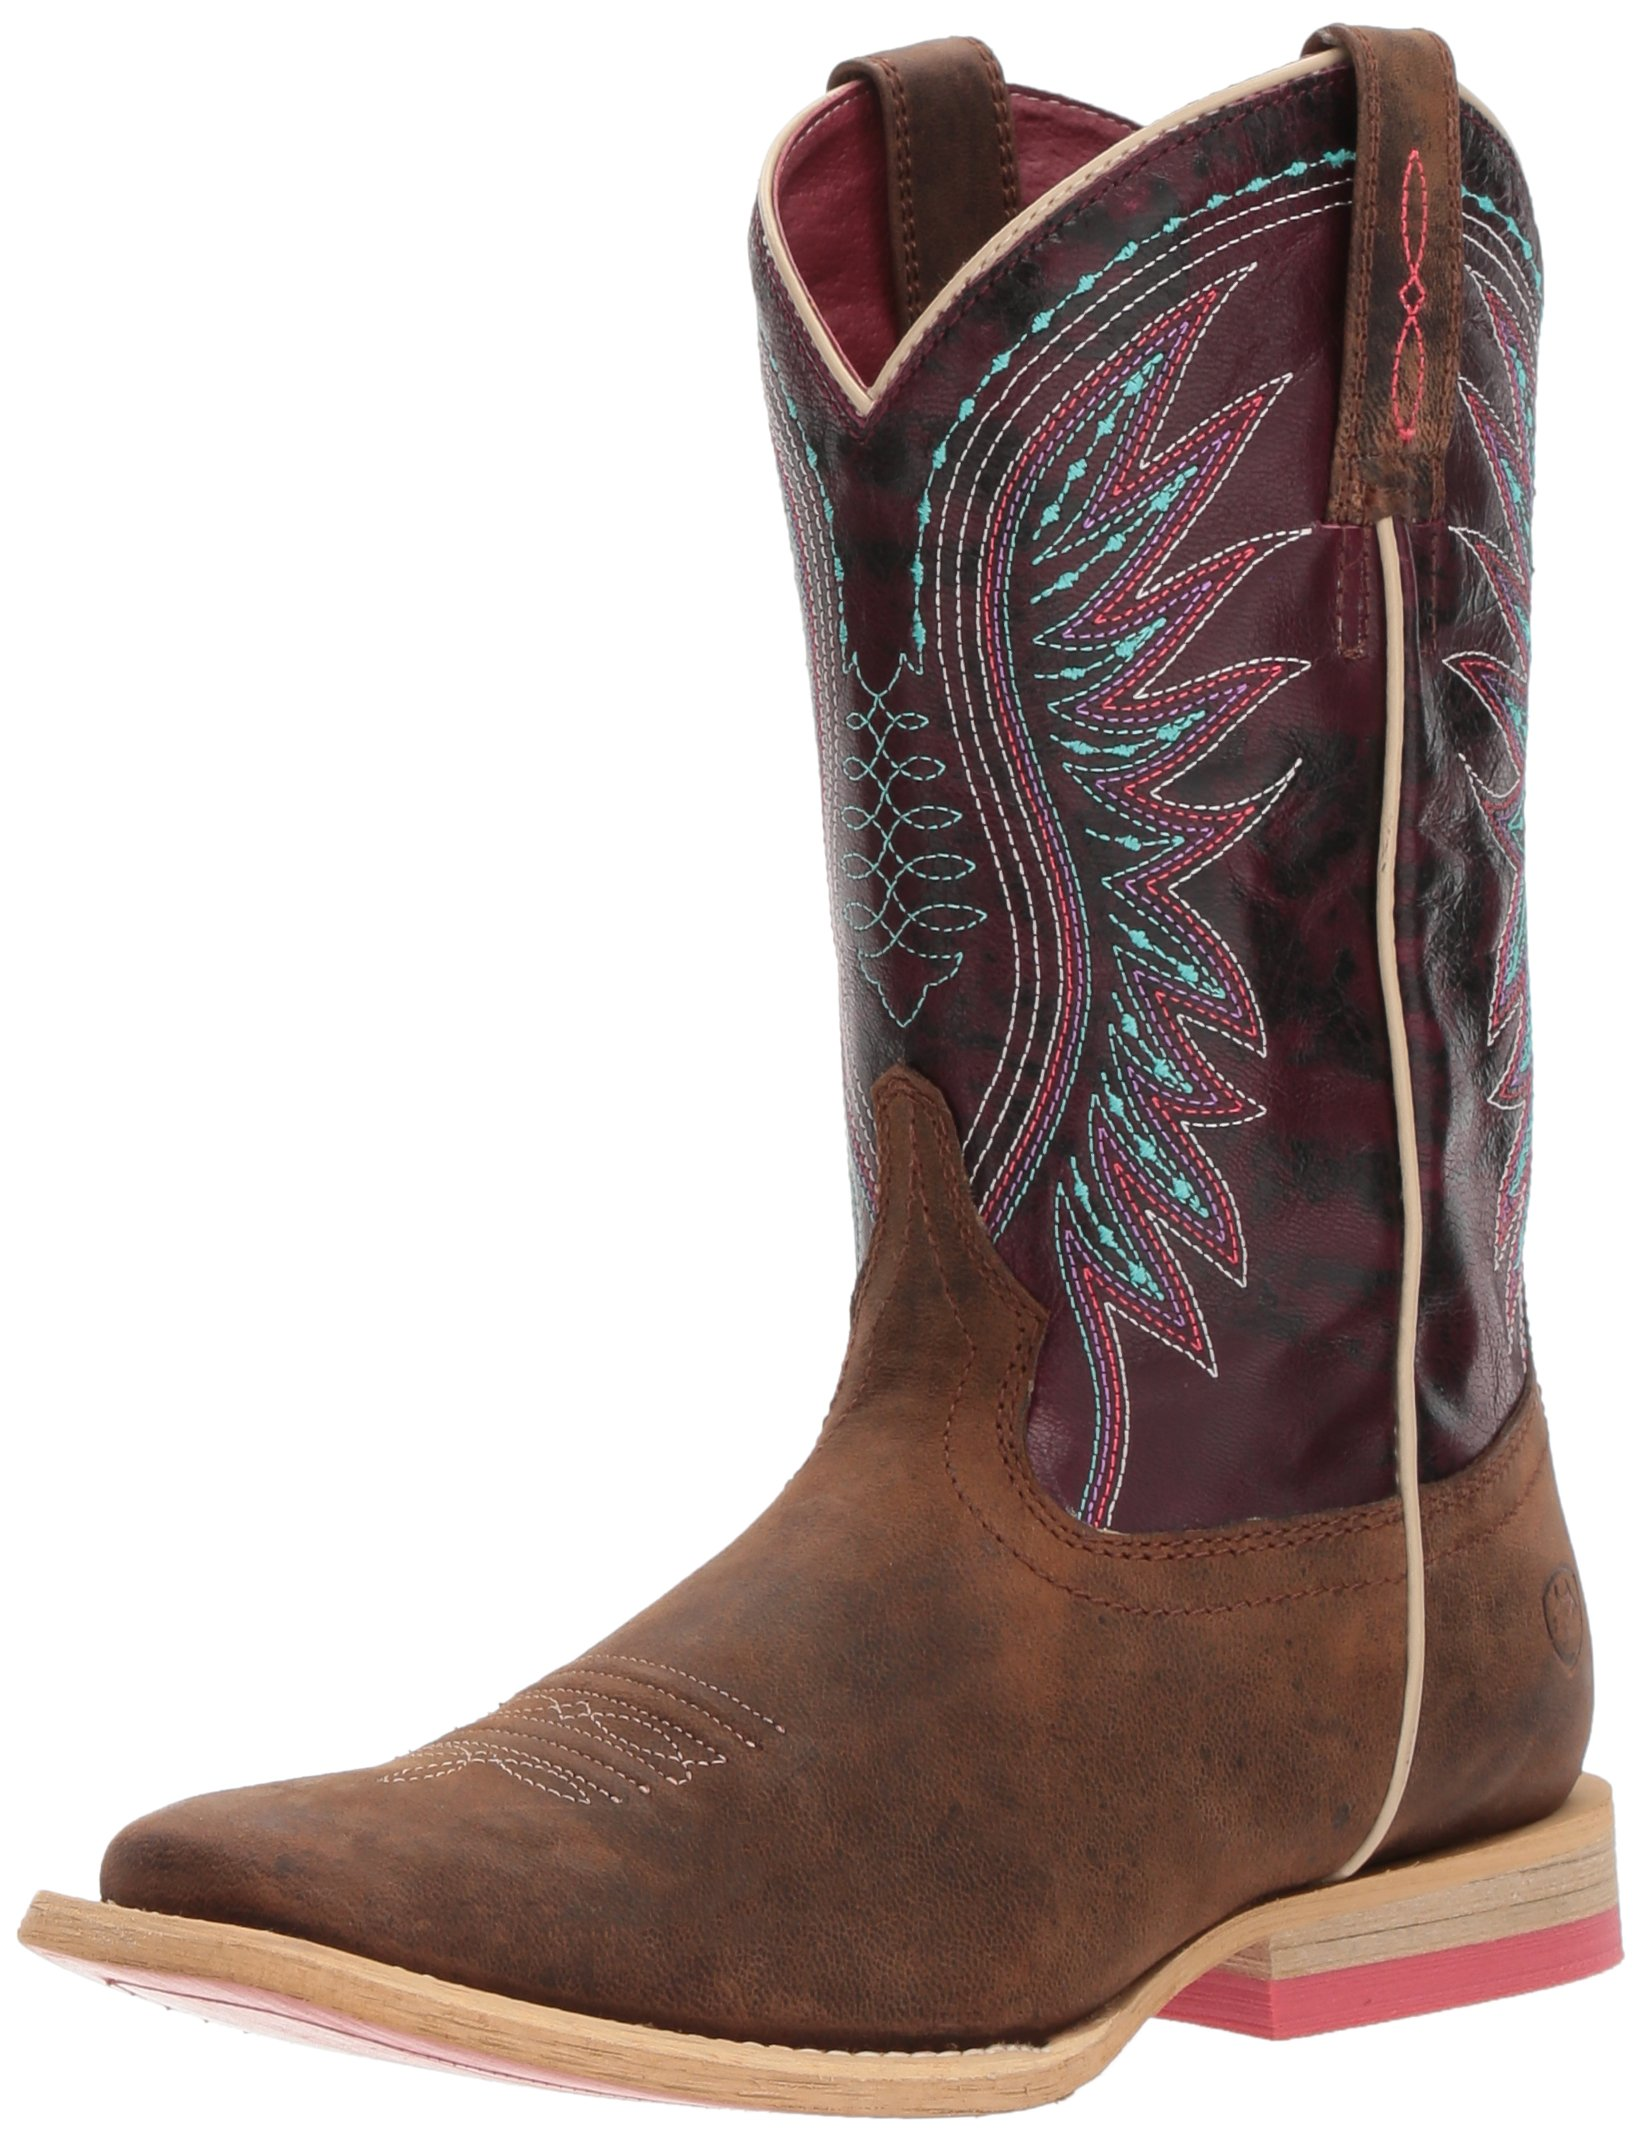 Kids' Vaquera Western Boot, Weathered Brown/Sunset Purple, 12.5 M US Little Kid